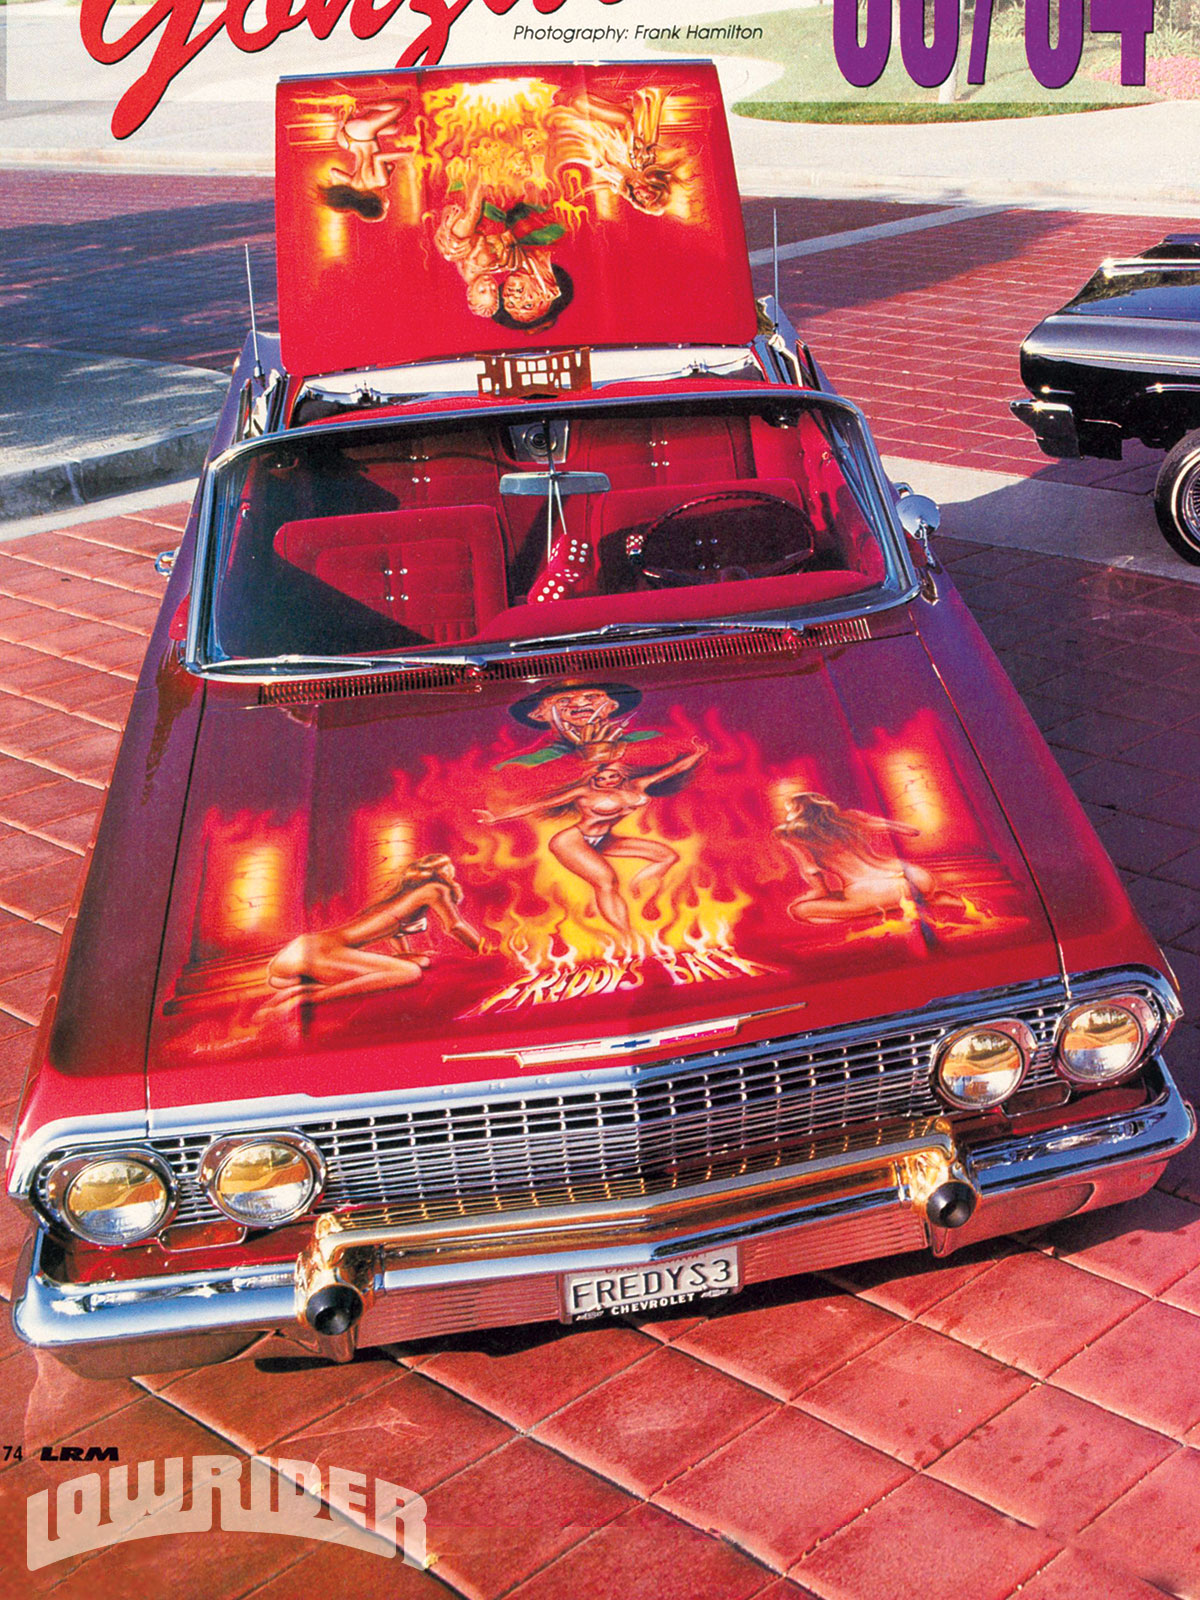 New Chevy Impala >> Classic Lowrider Images - Lowrider Magazine